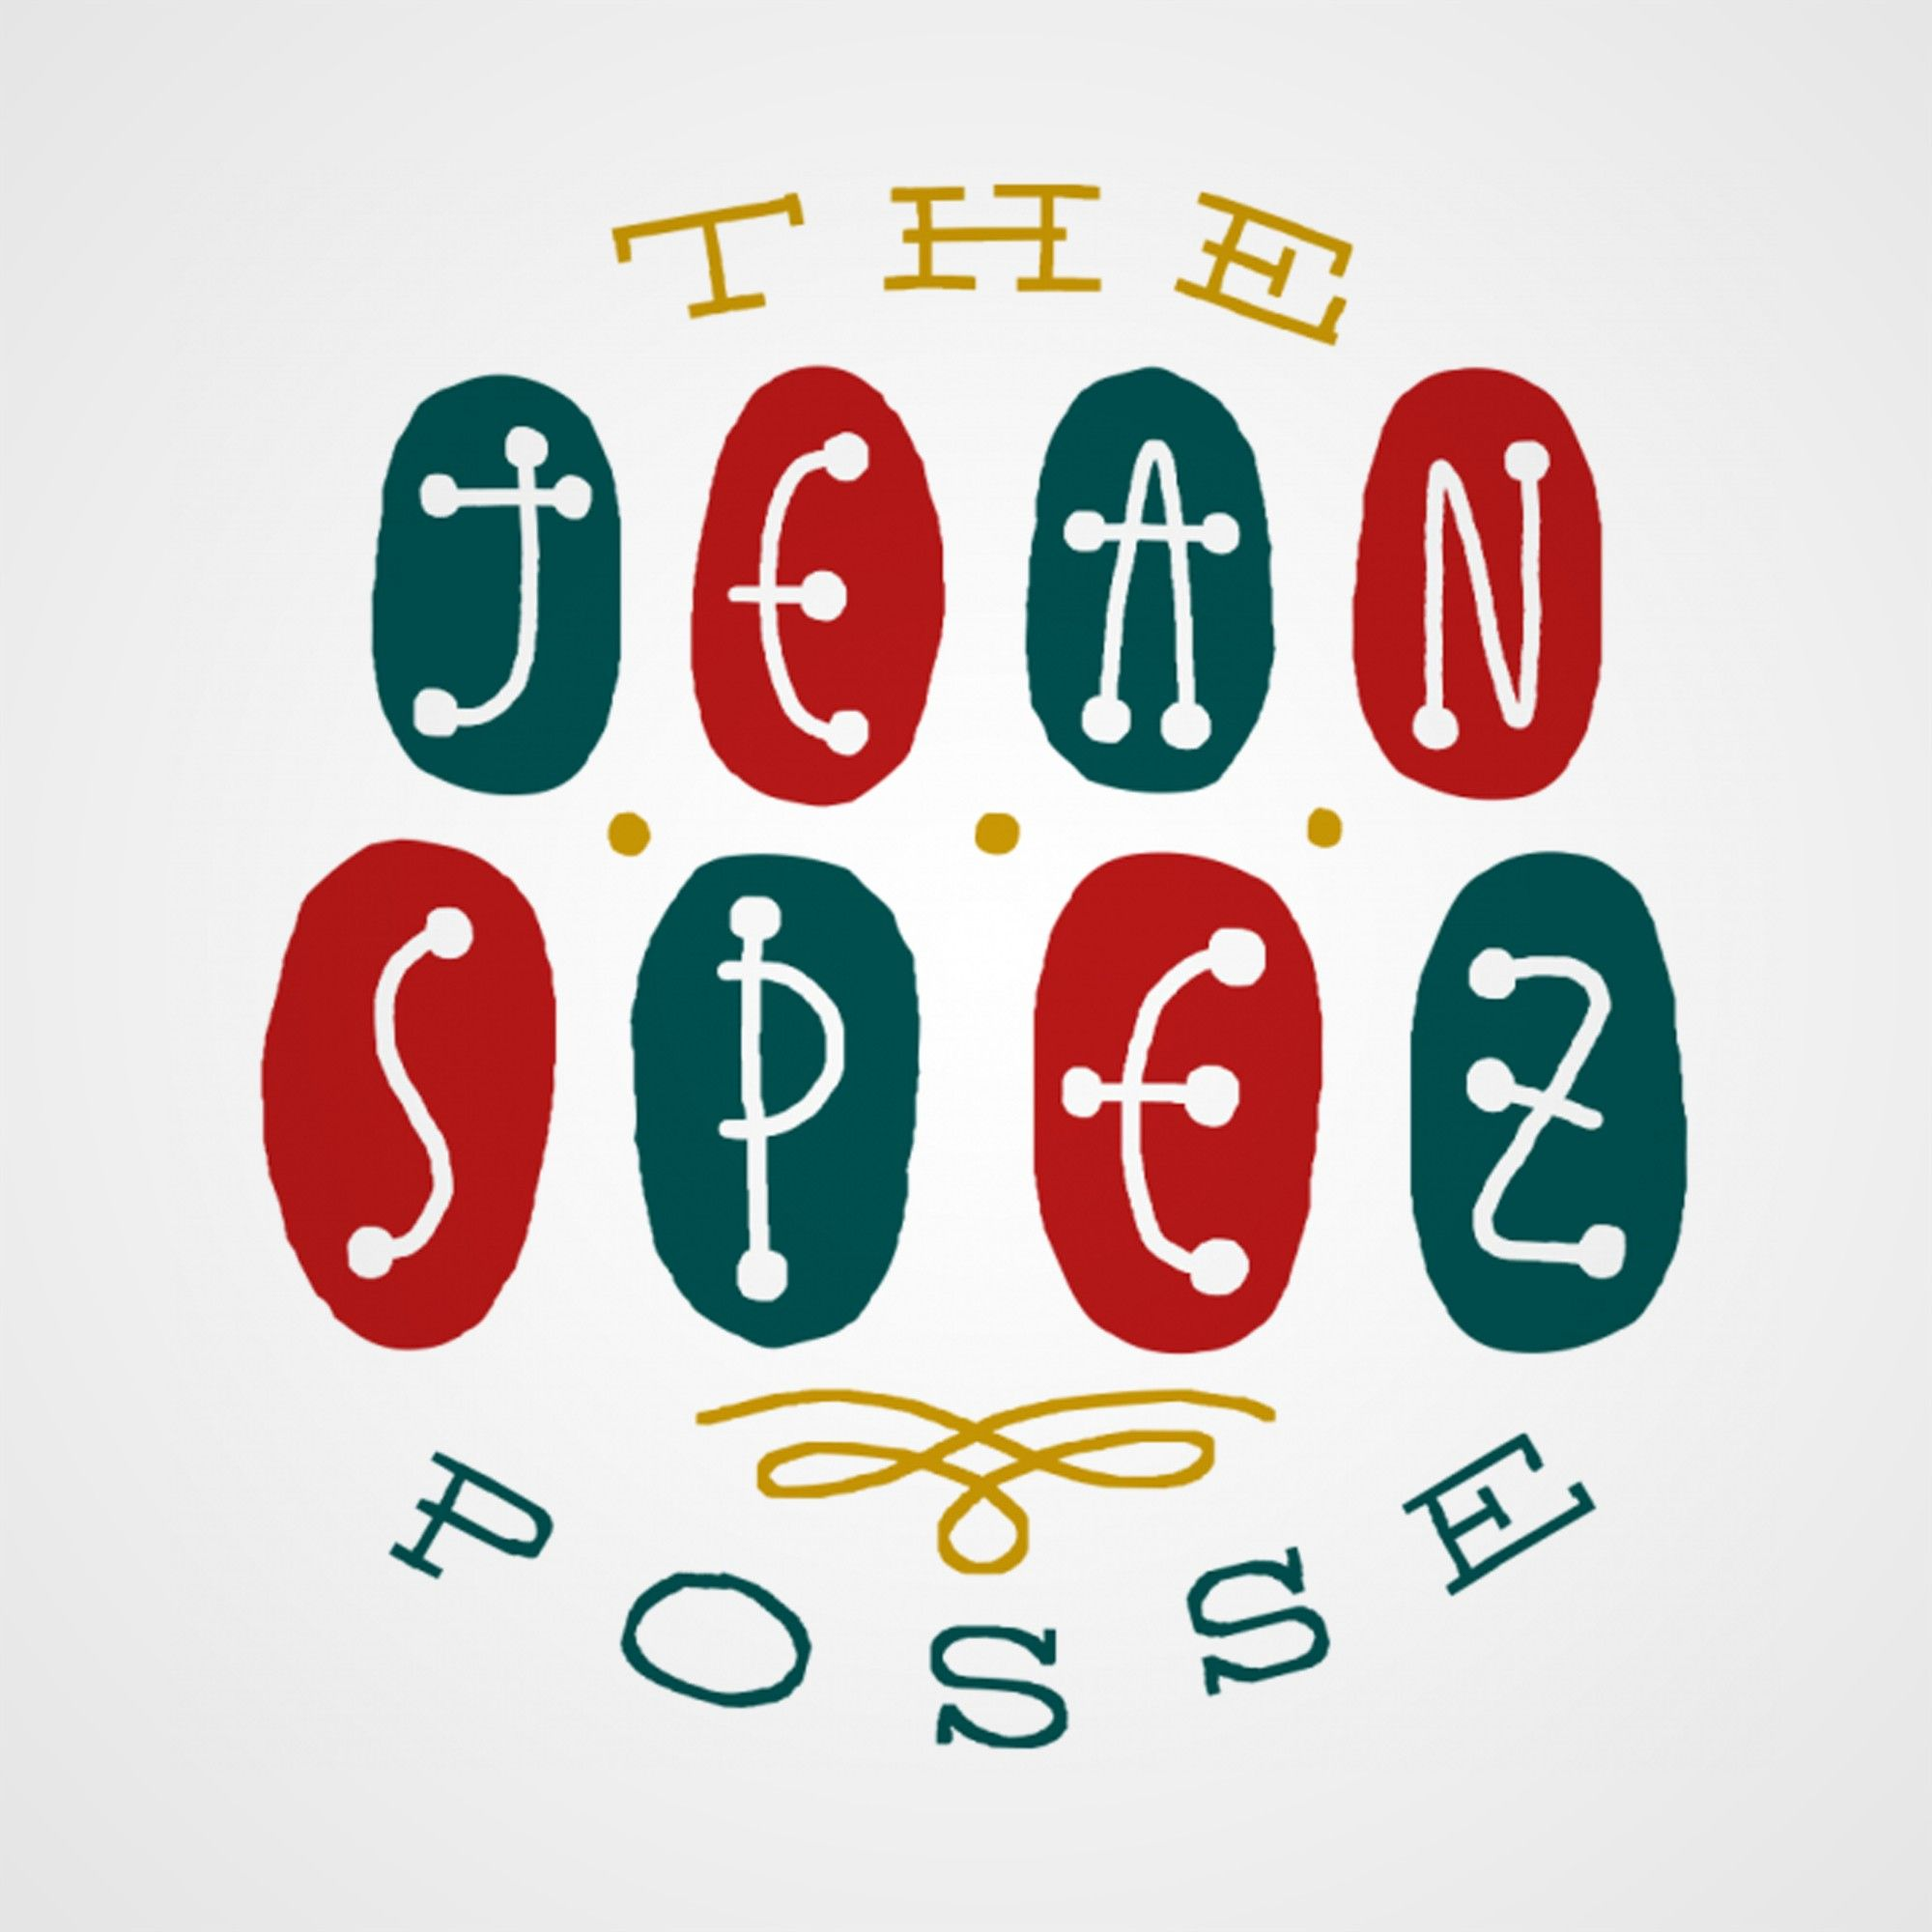 JeanSpezial